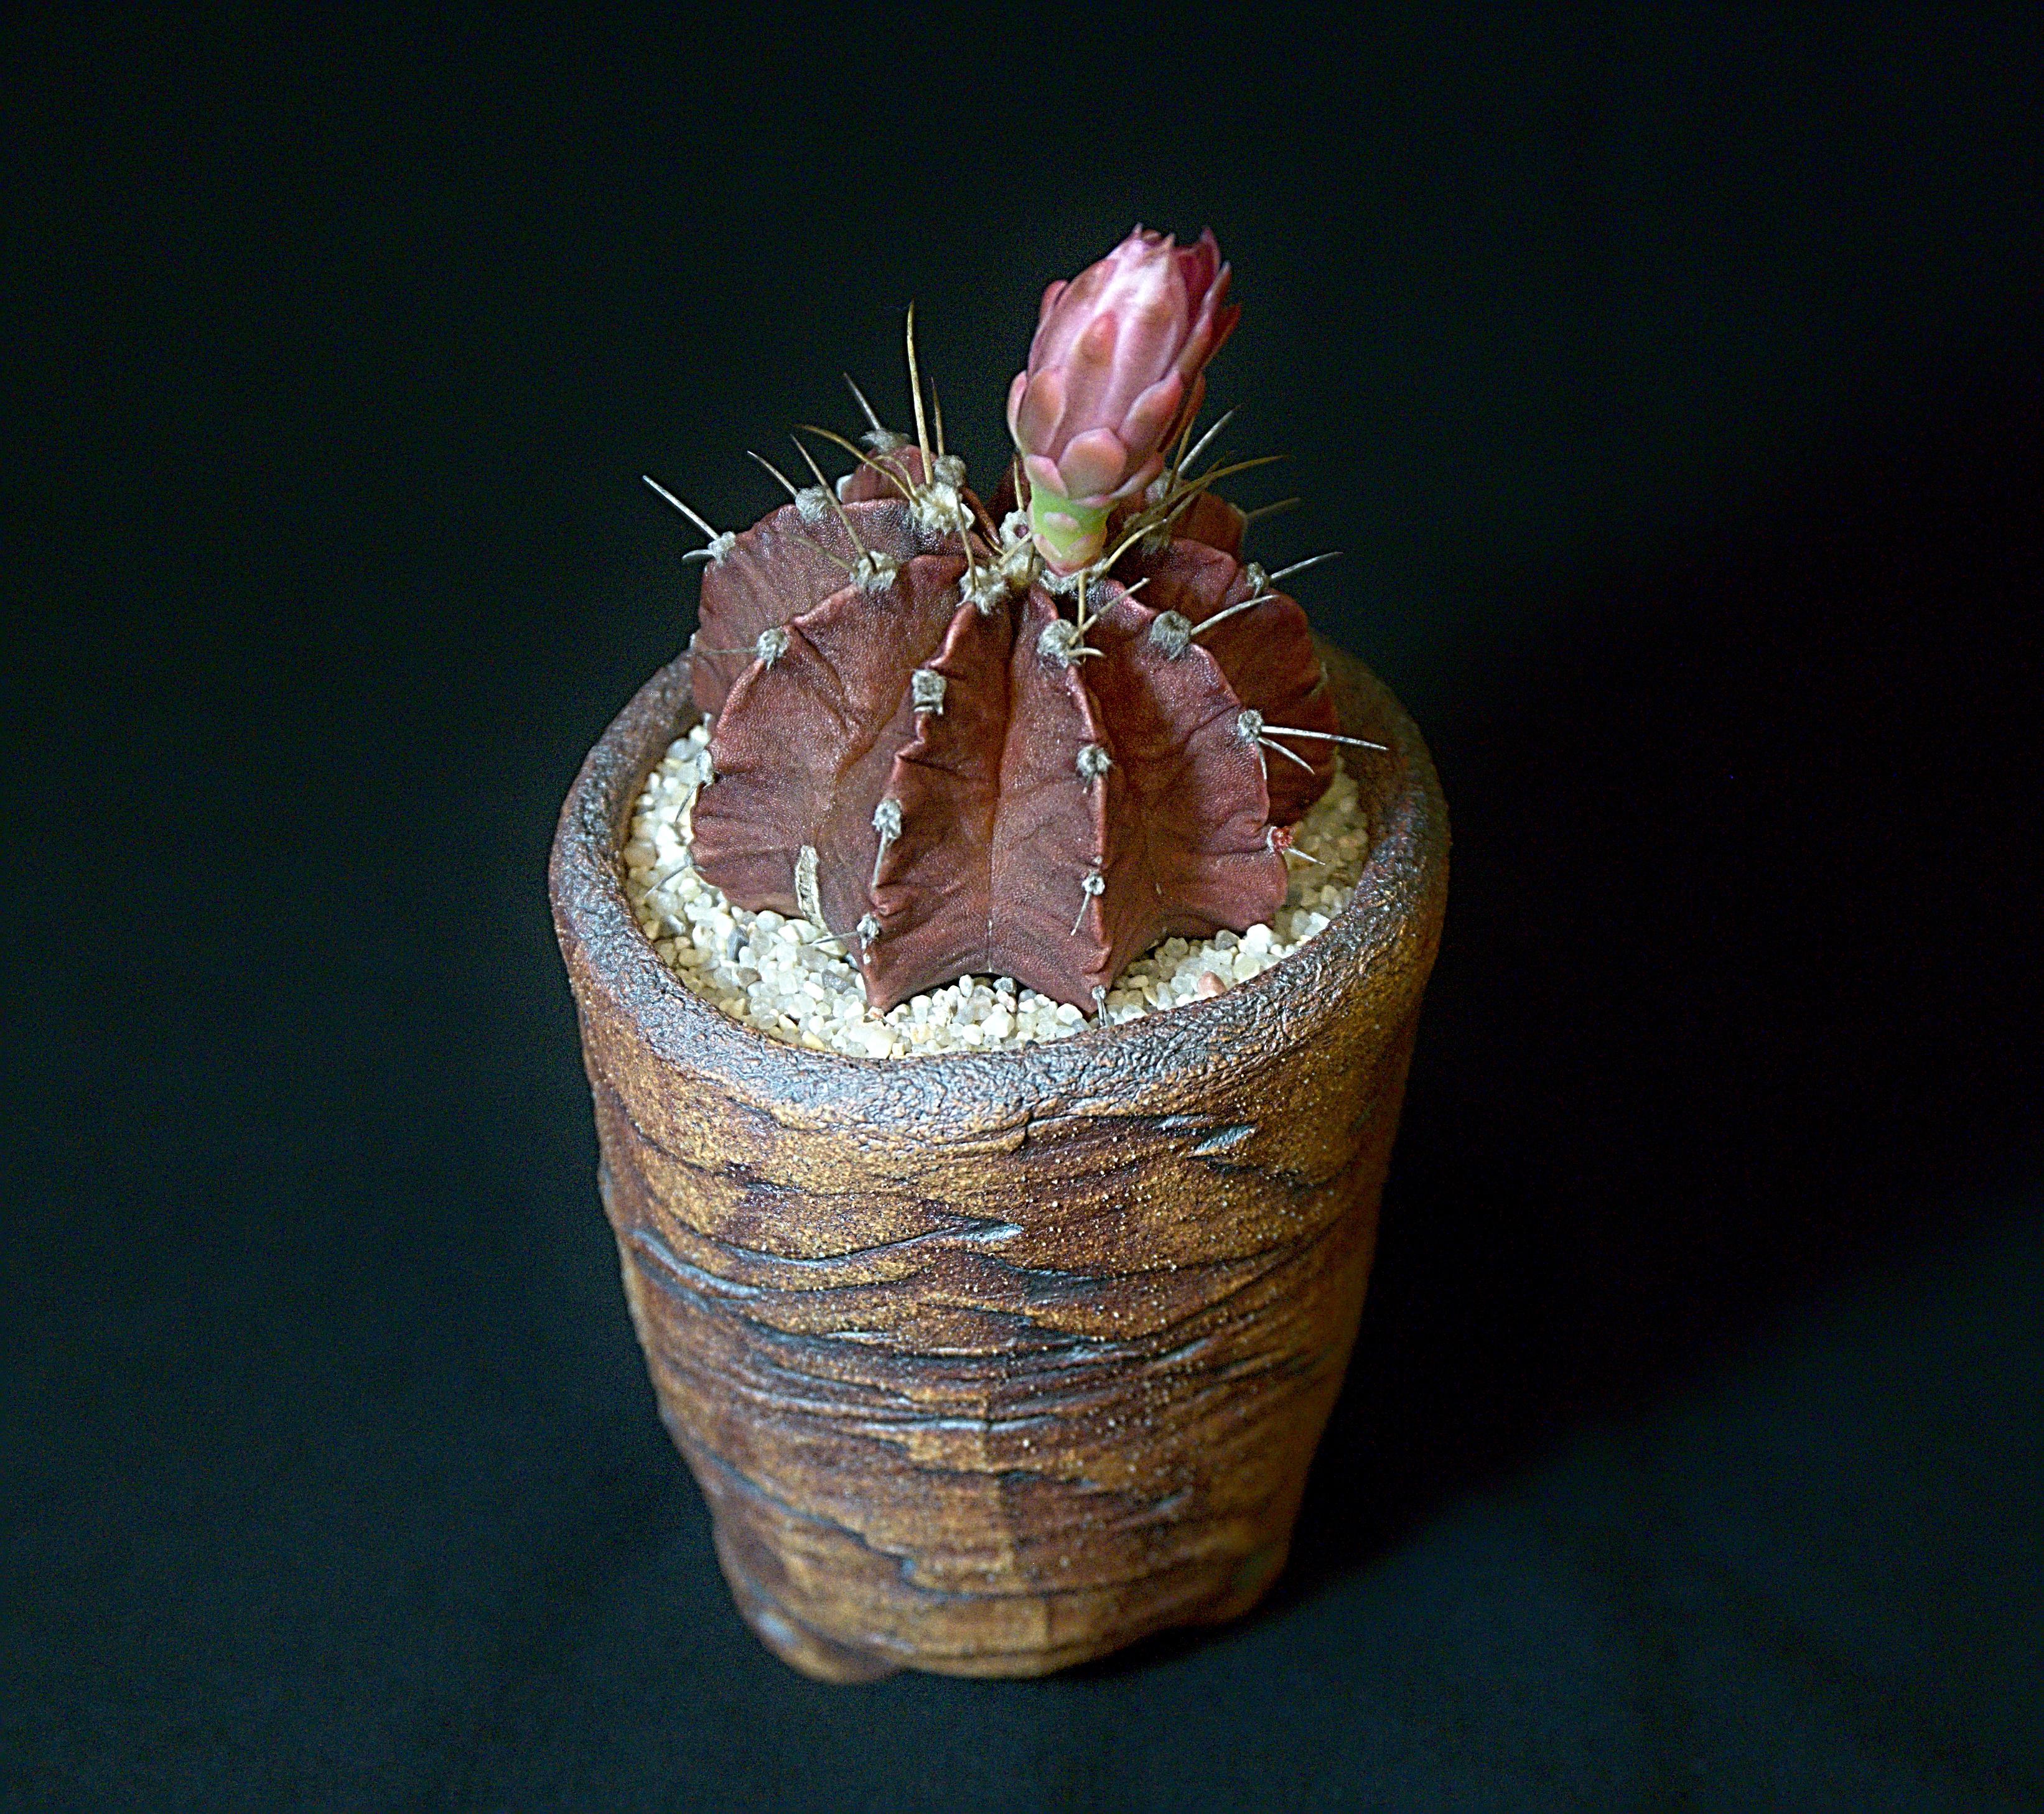 SCCSS 2018 June - Winner Intermediate Cactus - Sally Fasteau - Gymnocalycium stenopleurum